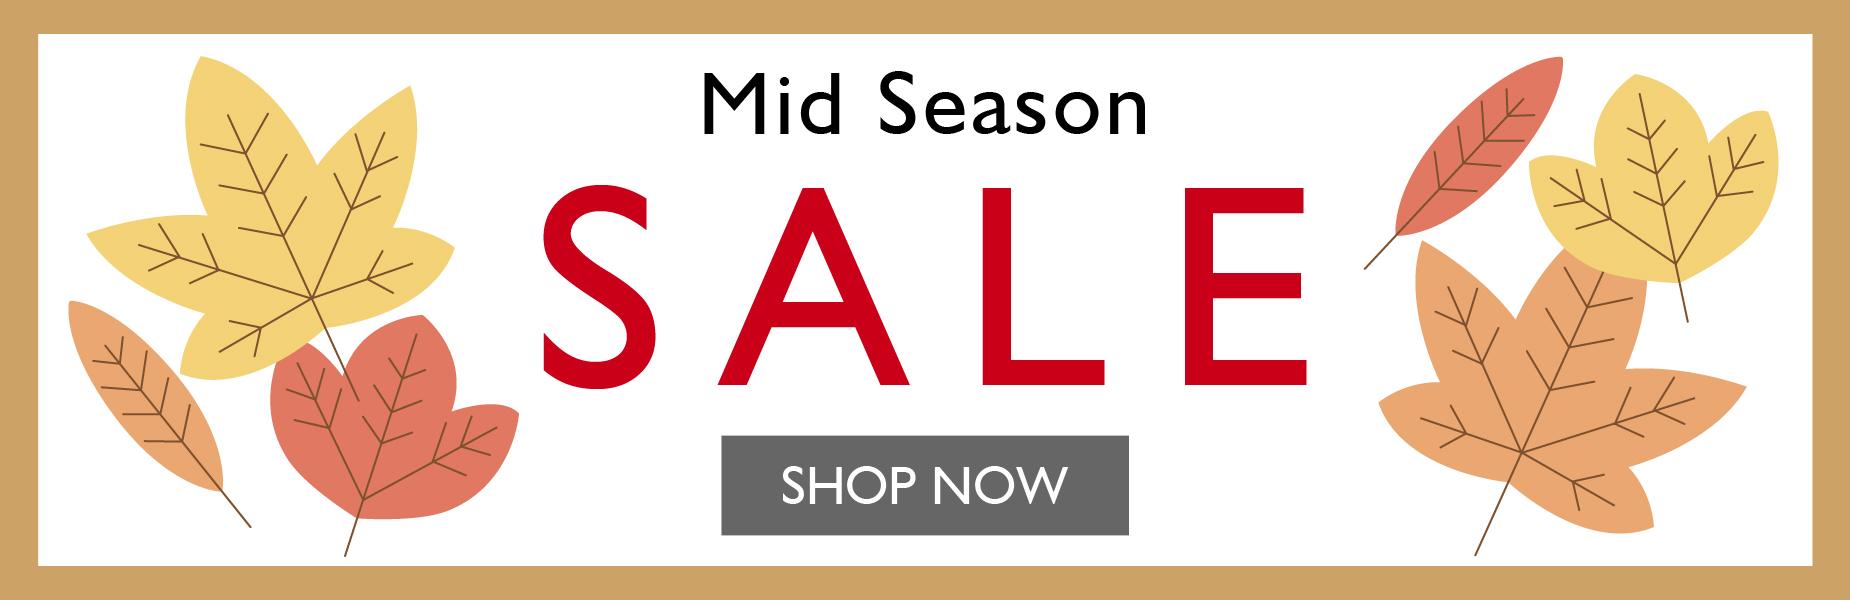 Mid Season SALE AW21 | Shop Now